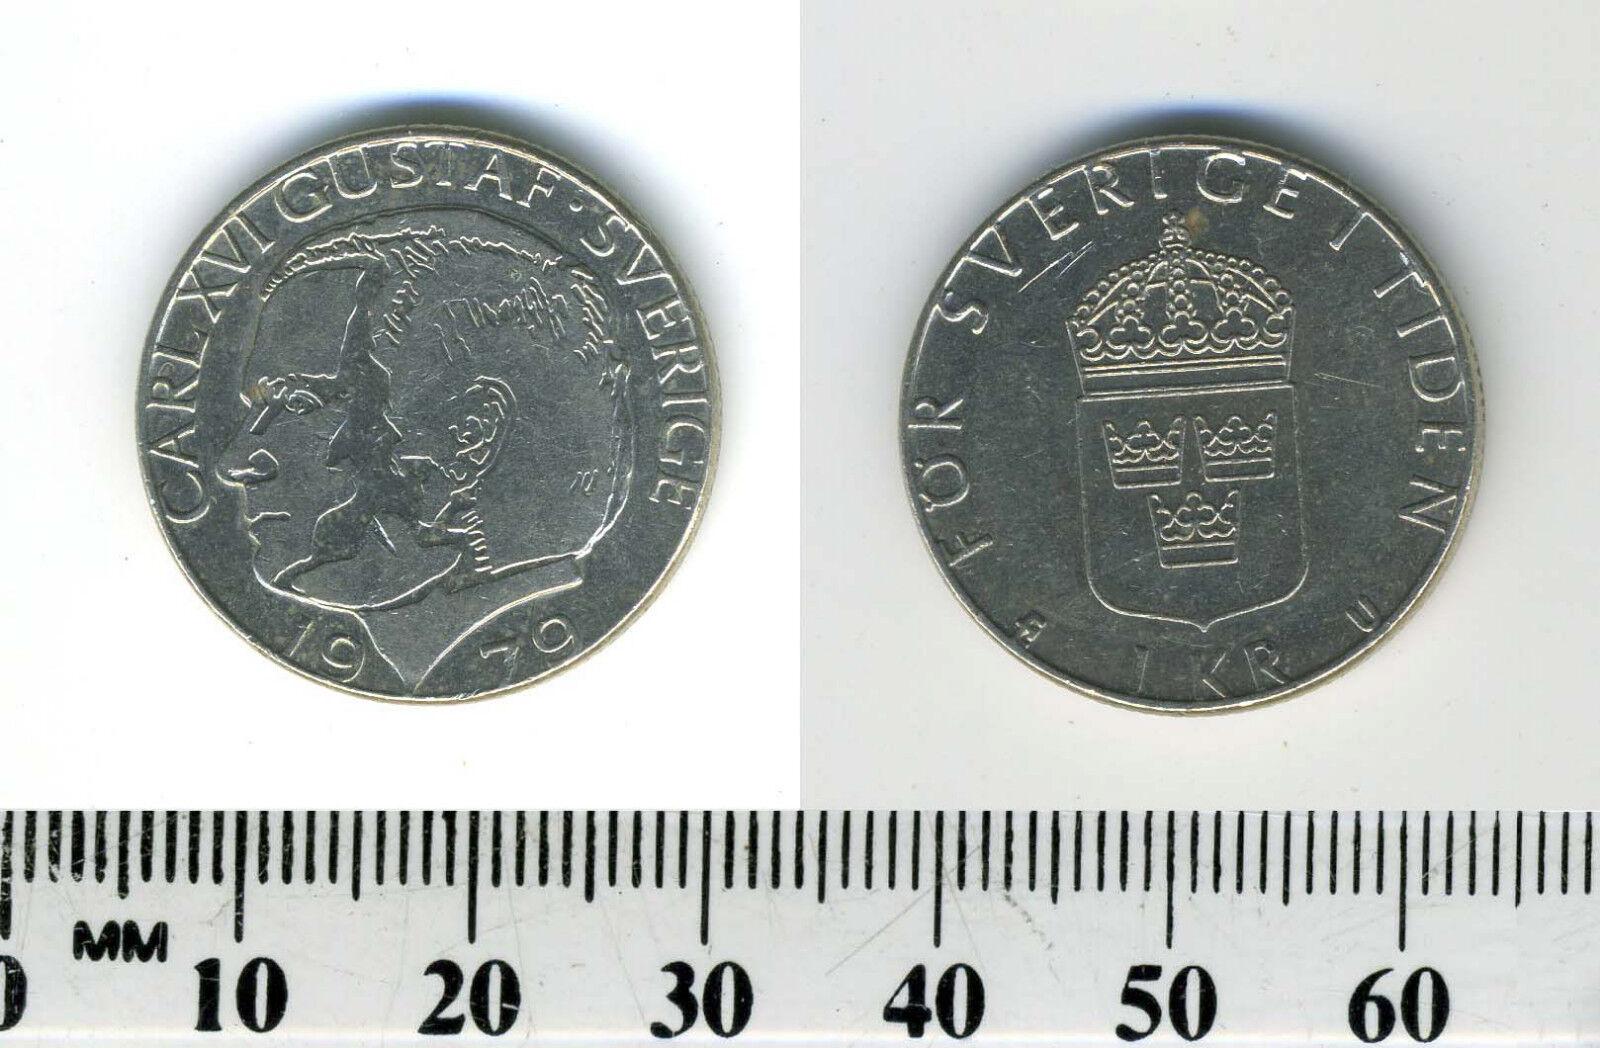 Sweden Krona 1979 Ebay